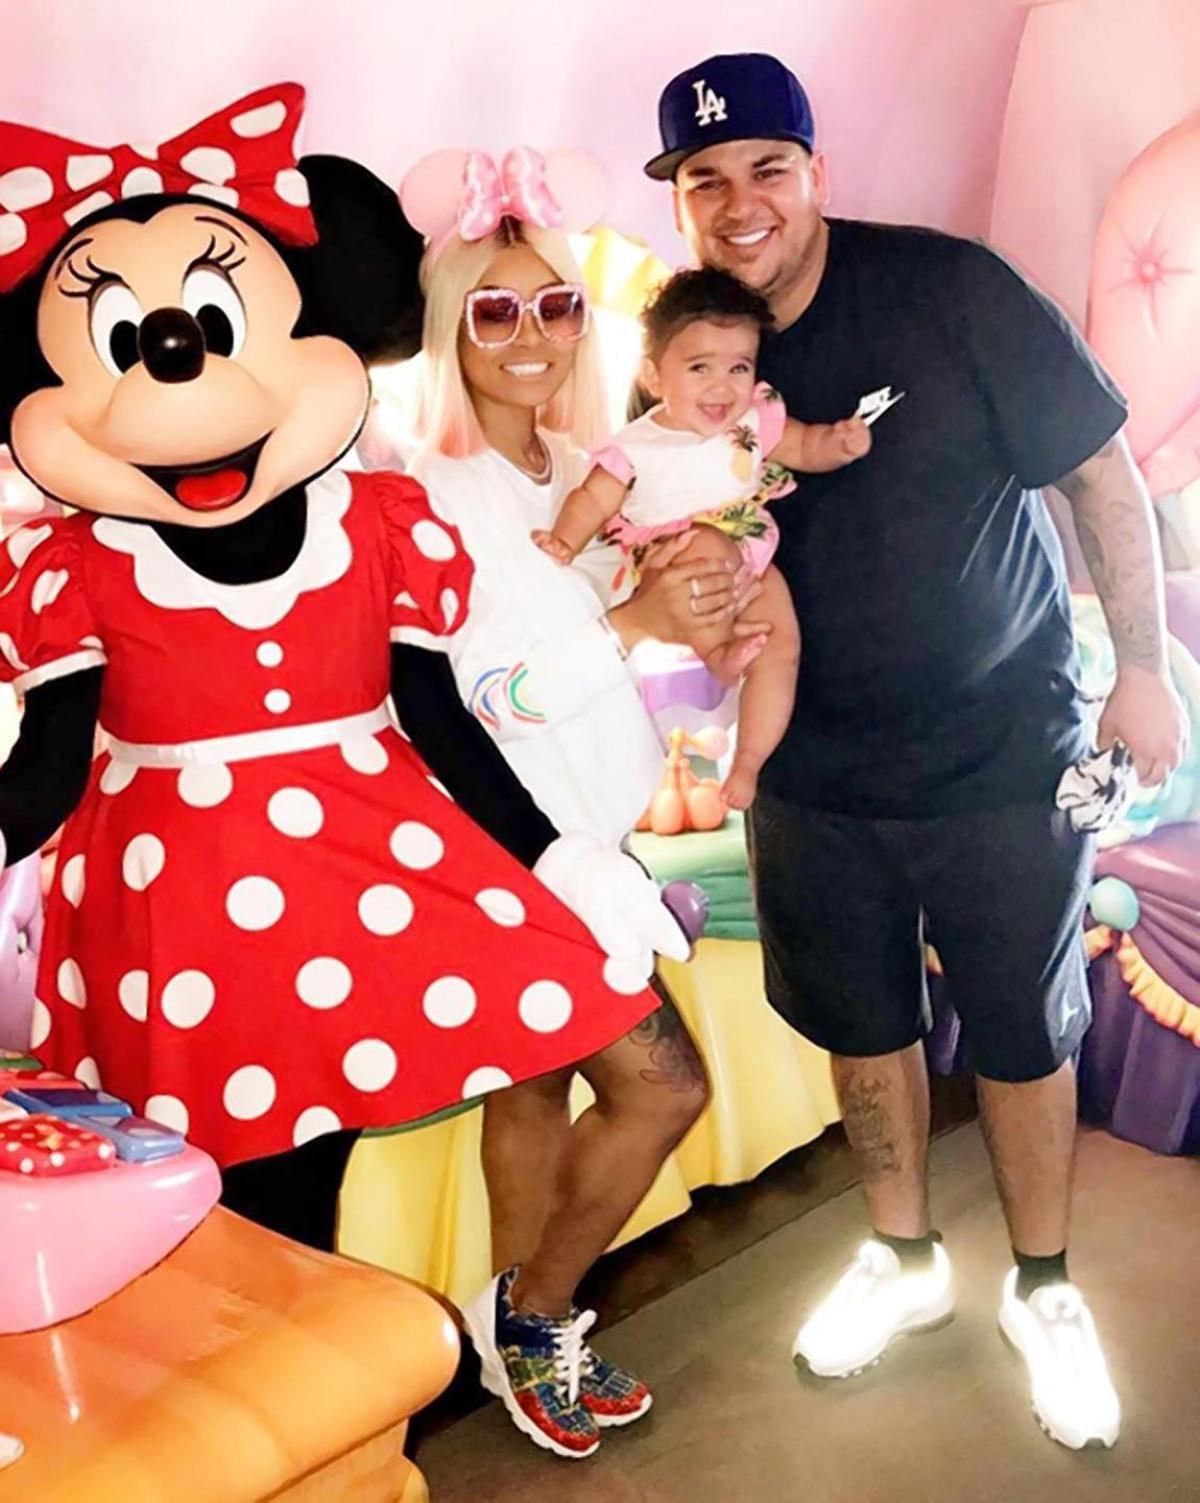 Rob Kardashian, Blac Chyna, and Dream Kardashian